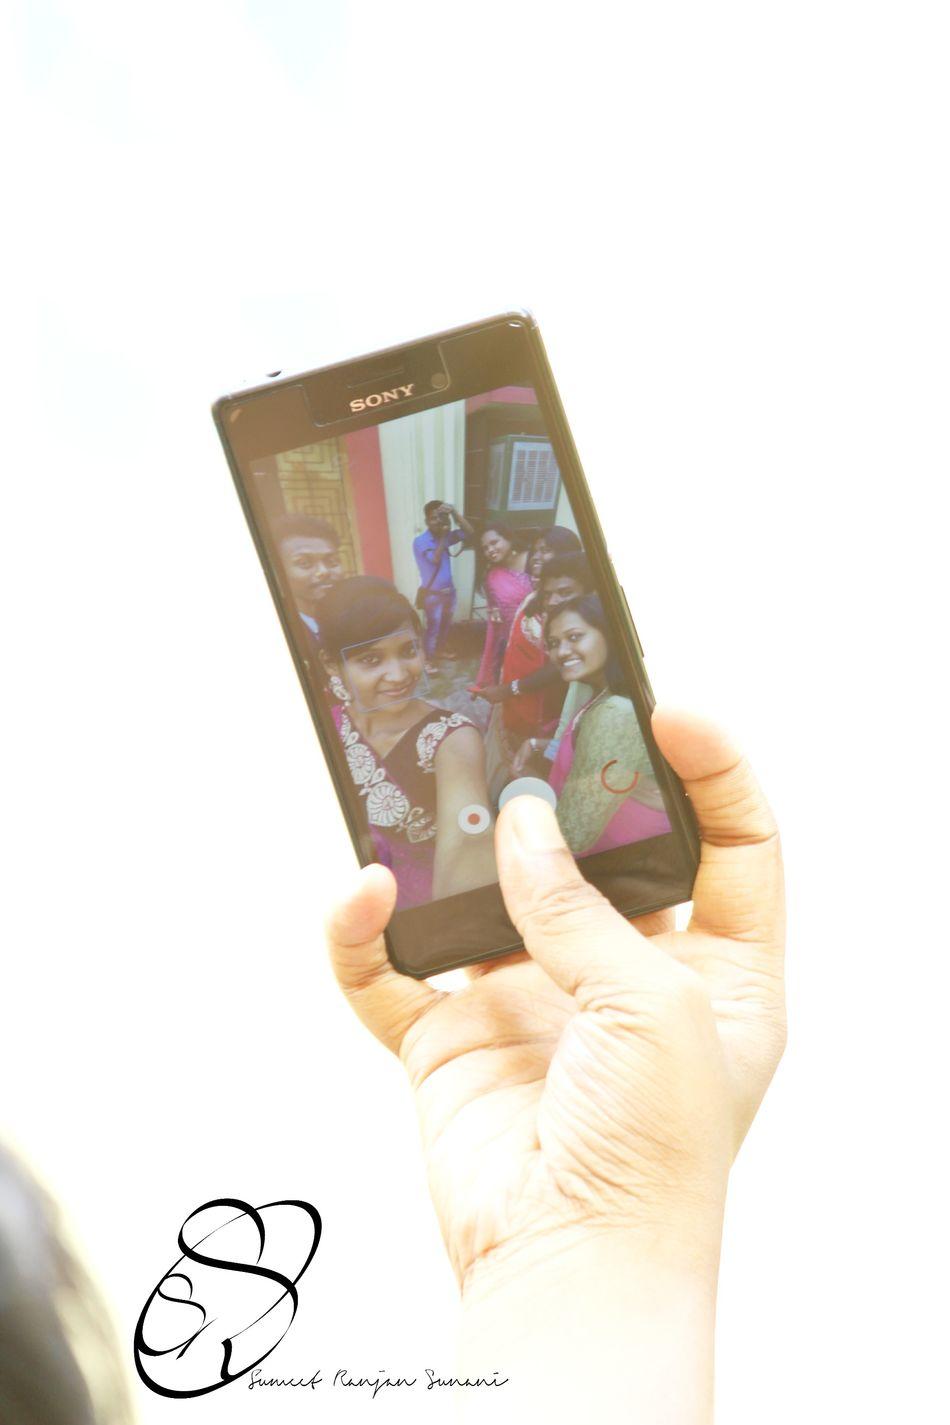 Focused Photo Selfie ✌ Canon700dphotography 250mmlens Farewell Party Rourkela Sony Hello World GroupSelfiePhoto